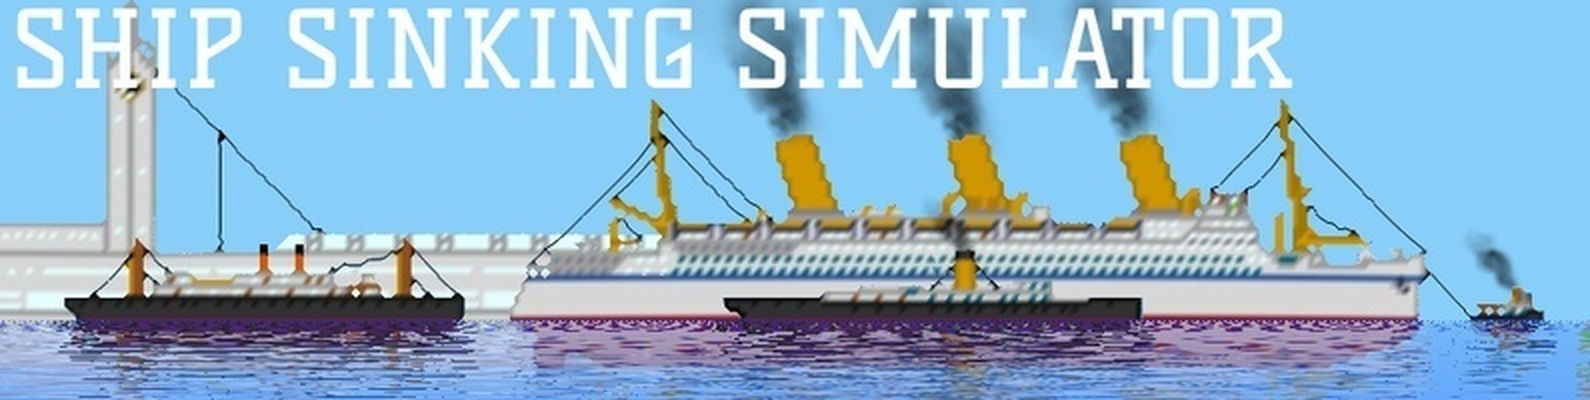 Sinking Ship Simulator | ВКонтакте